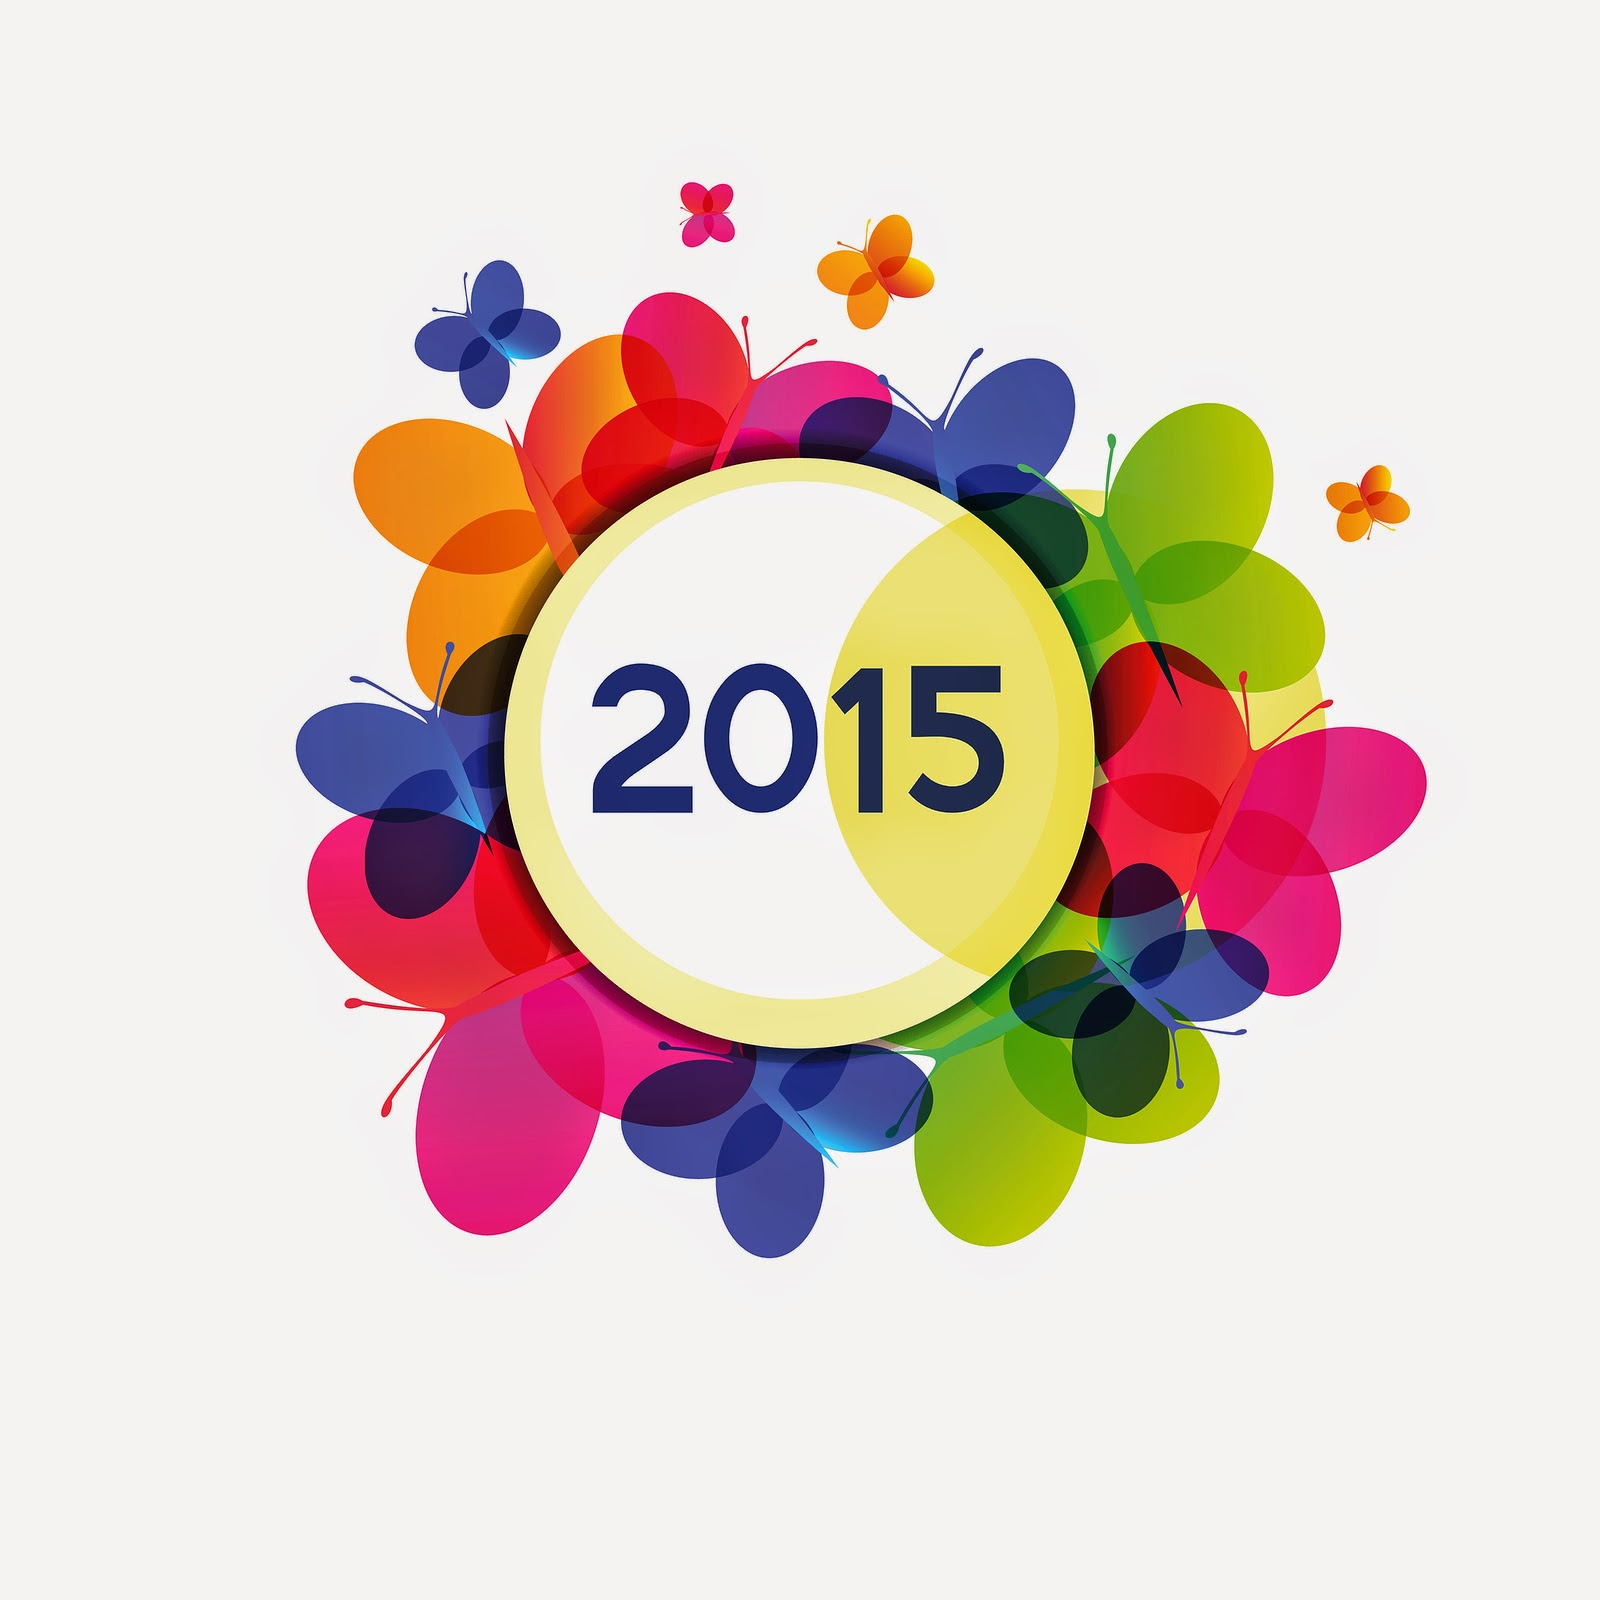 November 2014 happy new year photo 8 m4hsunfo